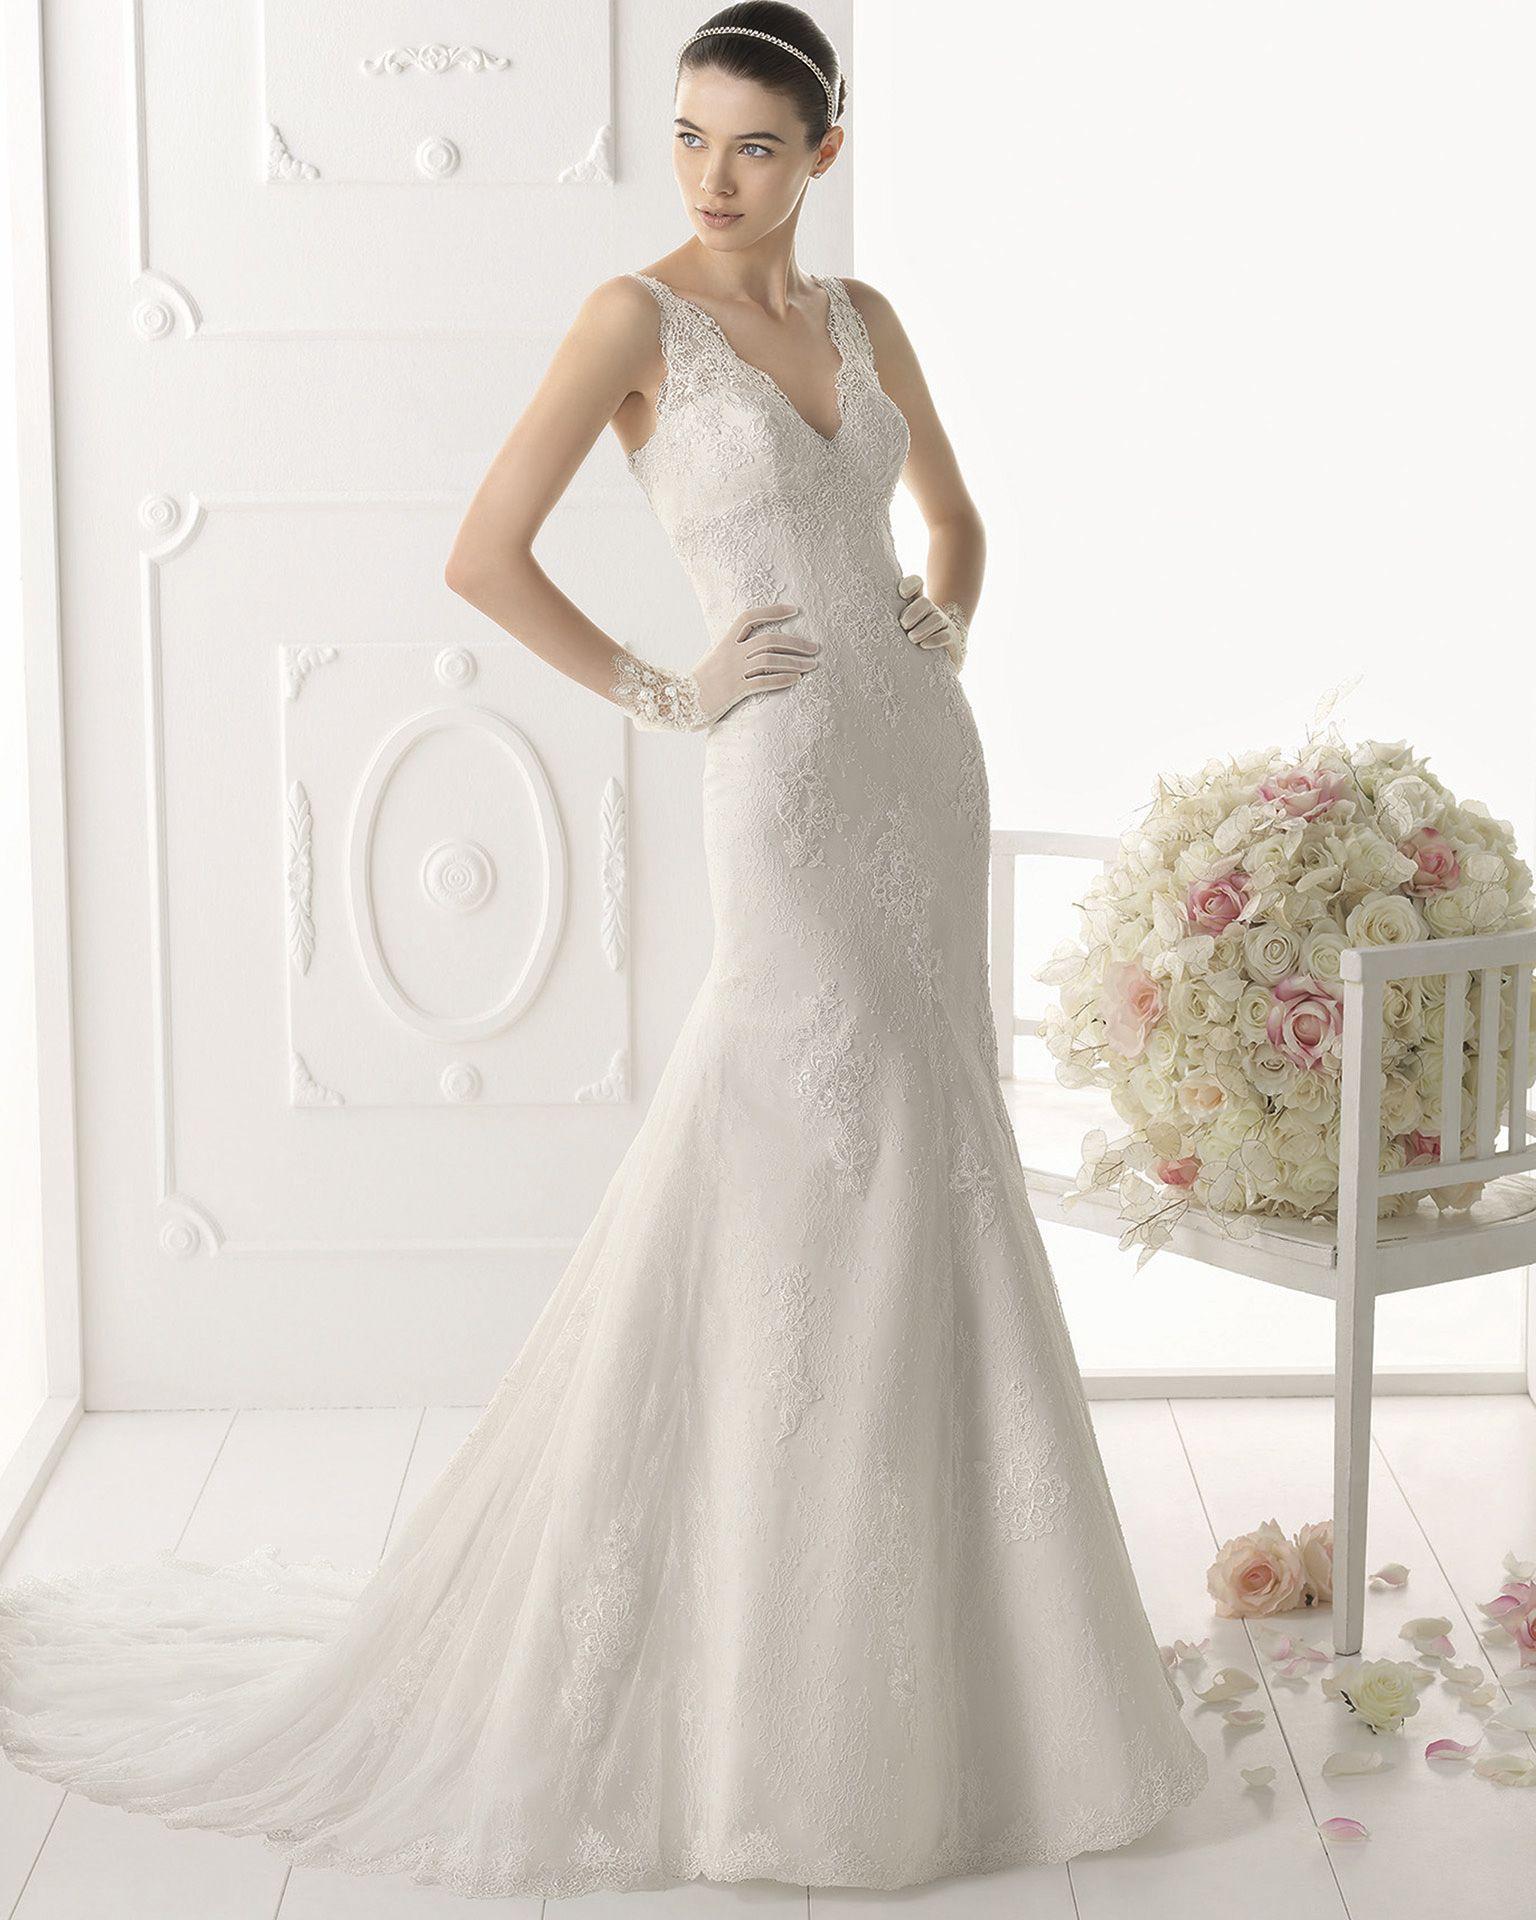 Aire barcelona wedding dresses  OTELOAIREBARCELONA  Sukulenty  Pinterest  Aire barcelona